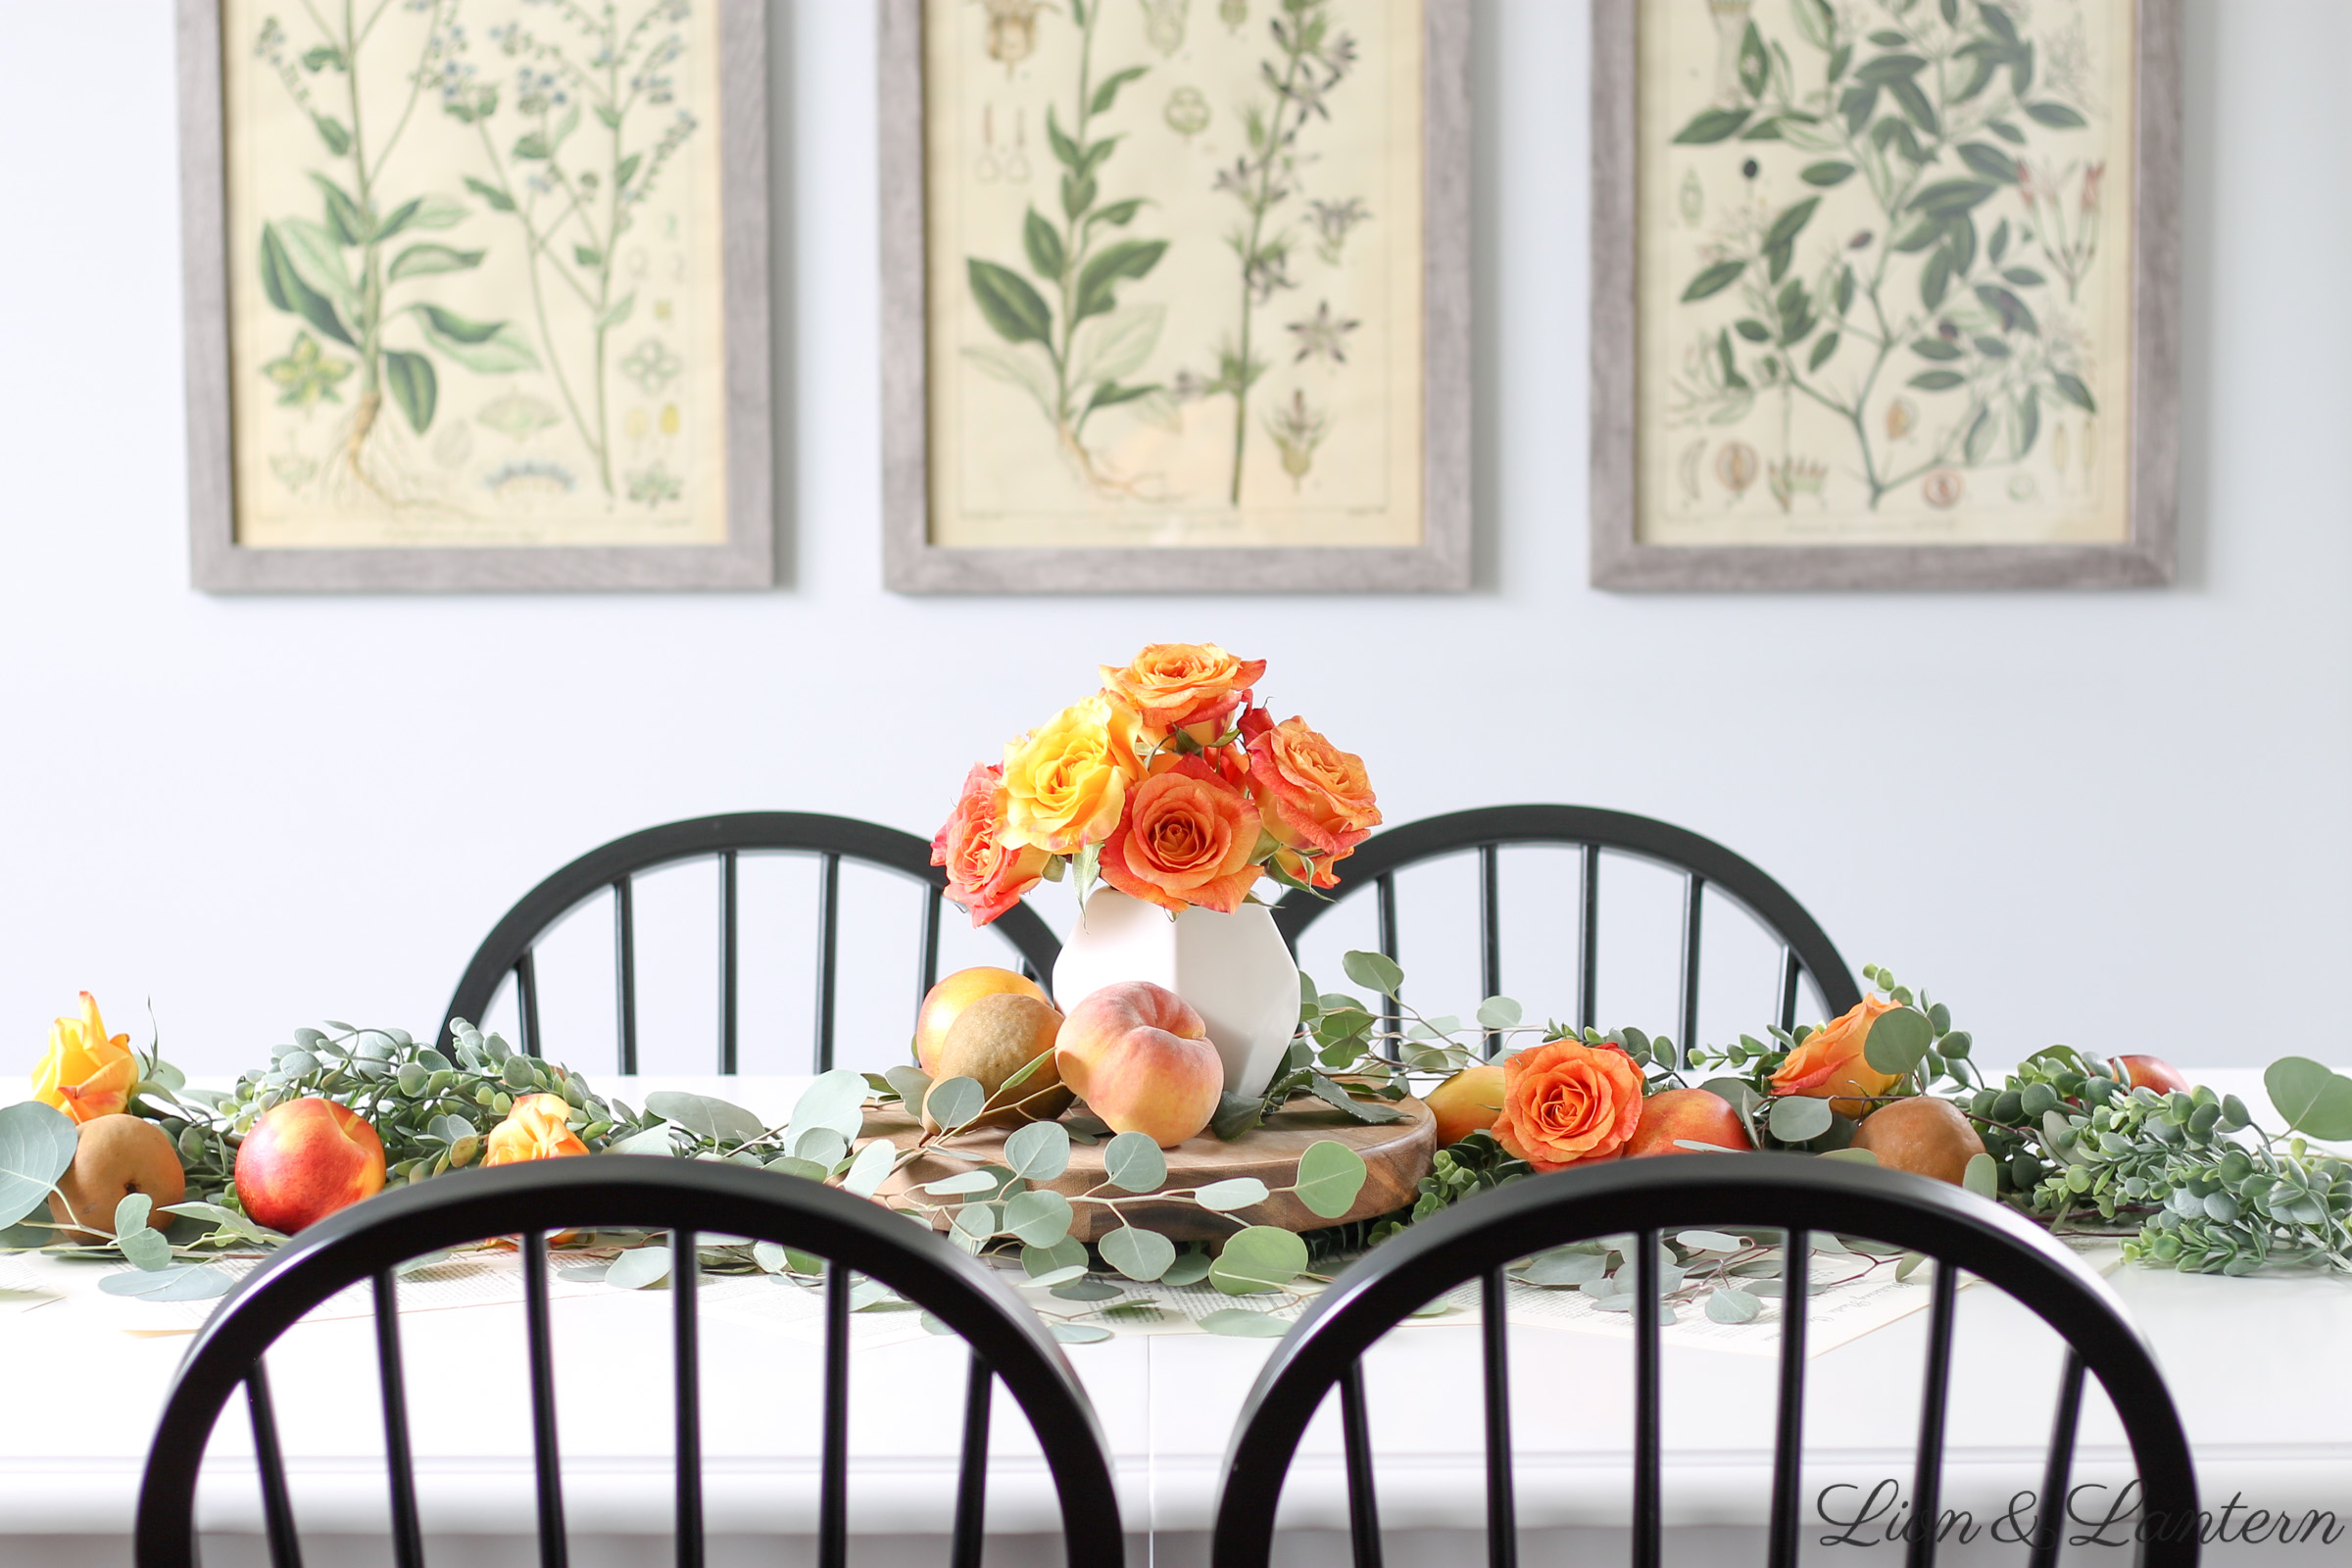 Fruit & Eucalyptus Fall Table at LionAndLantern.com   fall farmhouse decor, fall tablescape, autumn decor, peaches, pears, botanical prints